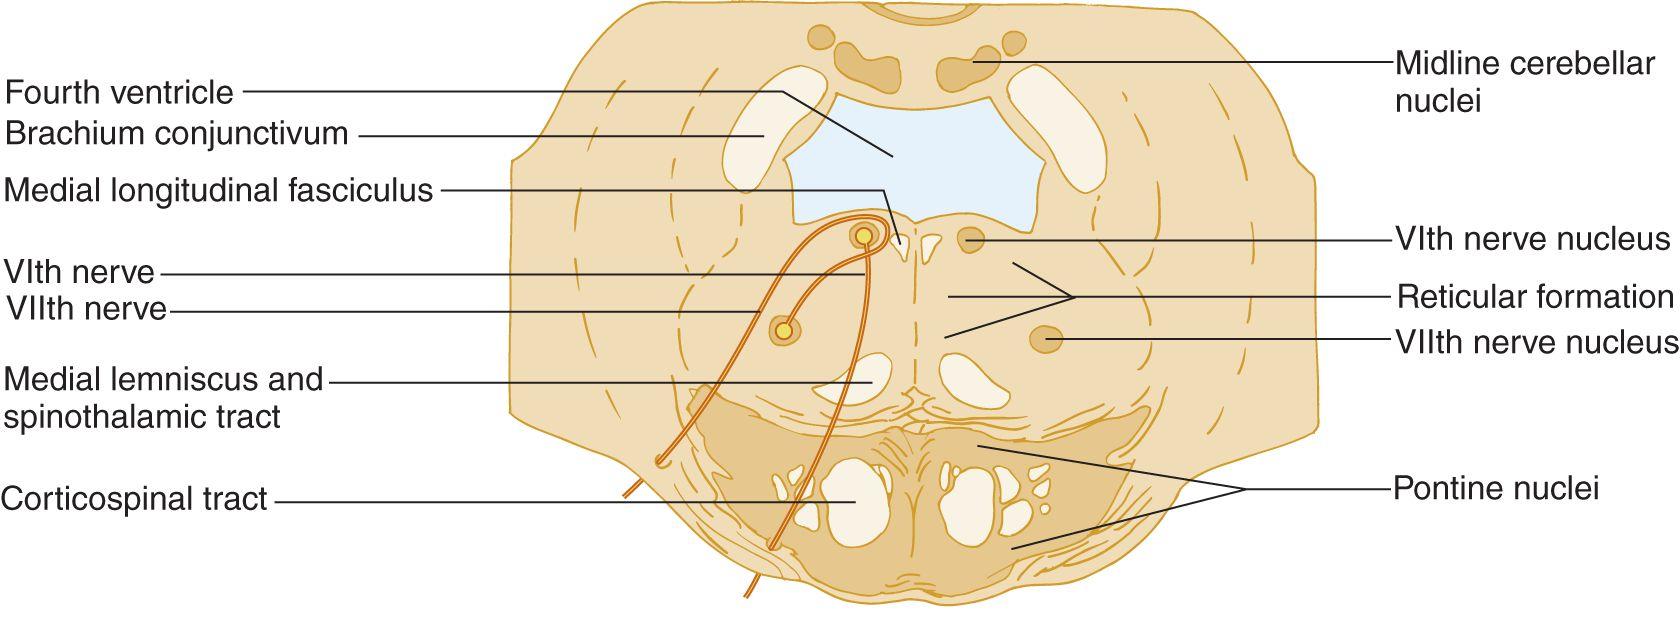 Examination Of The Motor Cranial Nerves V Vii Ix X Xi And Xii